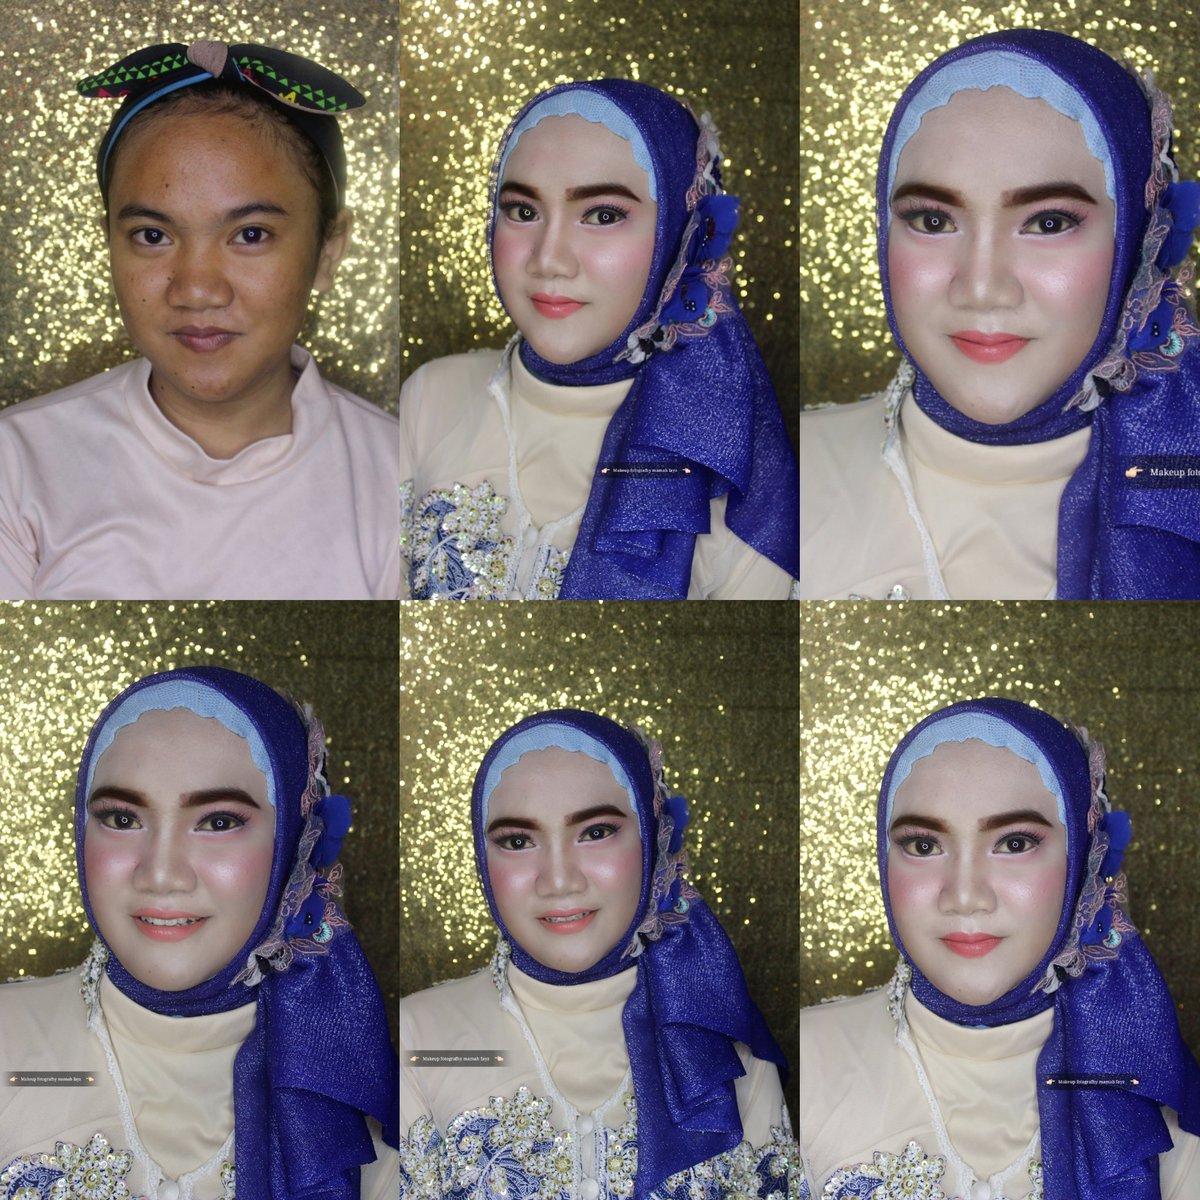 Makeup fotografhy mamah fayz 💄💄#prewedding #riaspengantinlamandau #riaslamandau #riaspengantin #riaspesta #riasfashion #riasfashionshow #riaskondangan #riasperpisahan #hijabmoderen #hijabpengantin #hijabmuslimah #hijabfashion #hijabpesta #lamandau #nangabulik #kalteng https://t.co/Yw8wXdHRiE